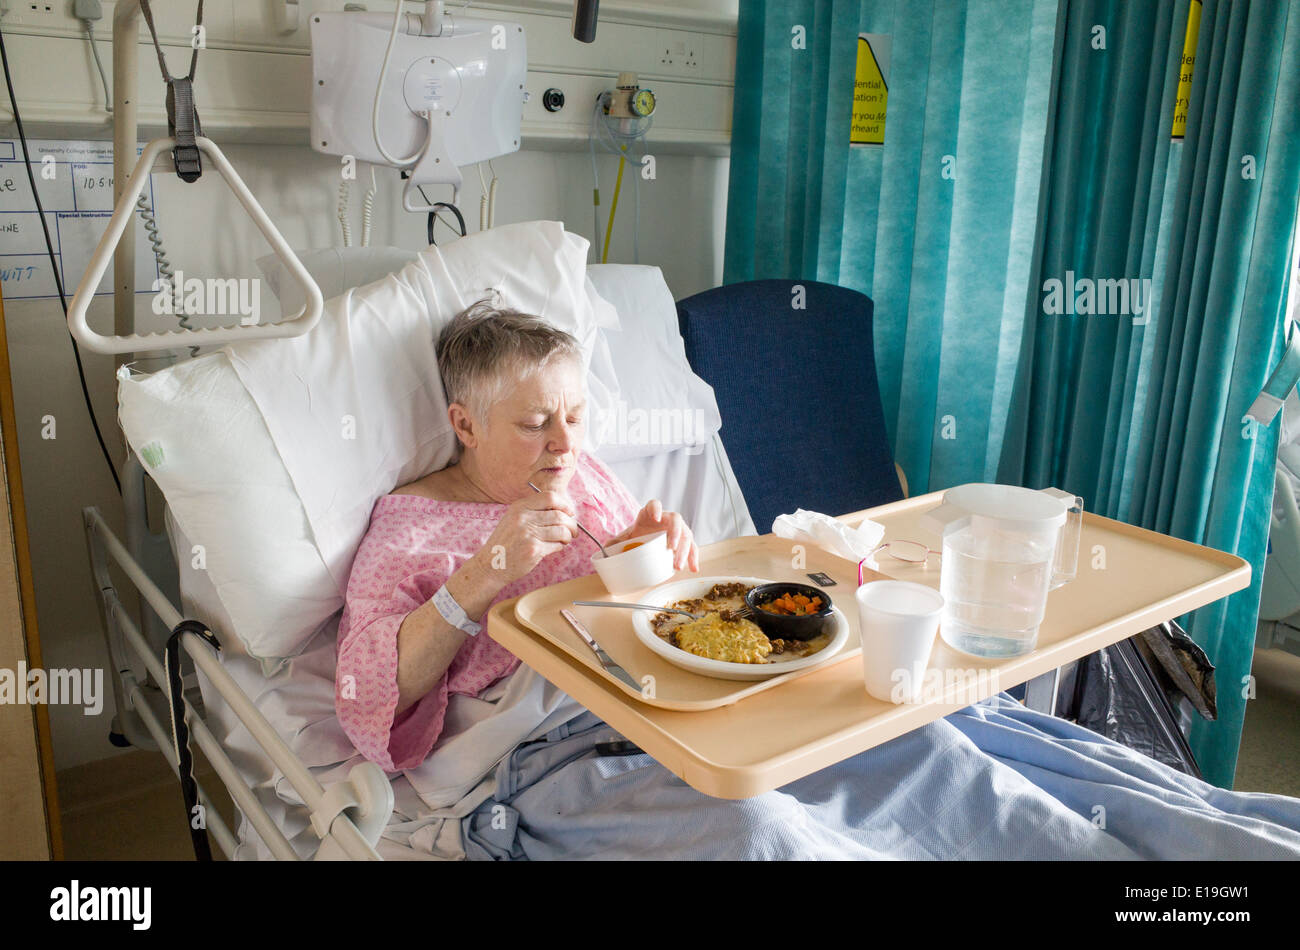 Elderly patient in University College Hospital eating hospital food, London, England, UK - Stock Image